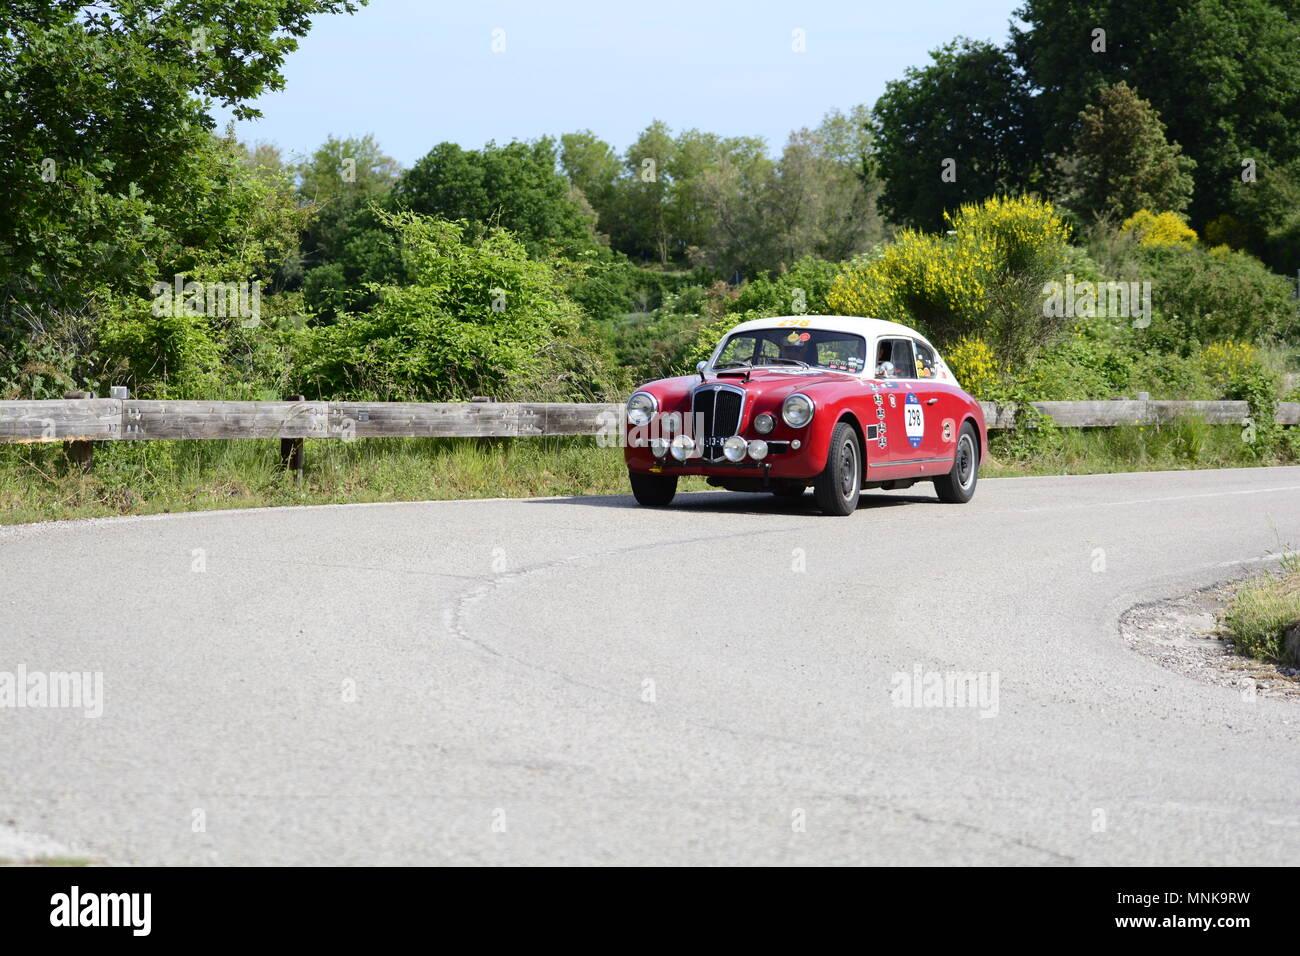 PESARO COLLE SAN BARTOLO , ITALY - MAY 17 - 2018 :  LANCIA AURELIA B20 GT1953  on an old racing car in rally Mille Miglia 2018 the famous italia - Stock Image